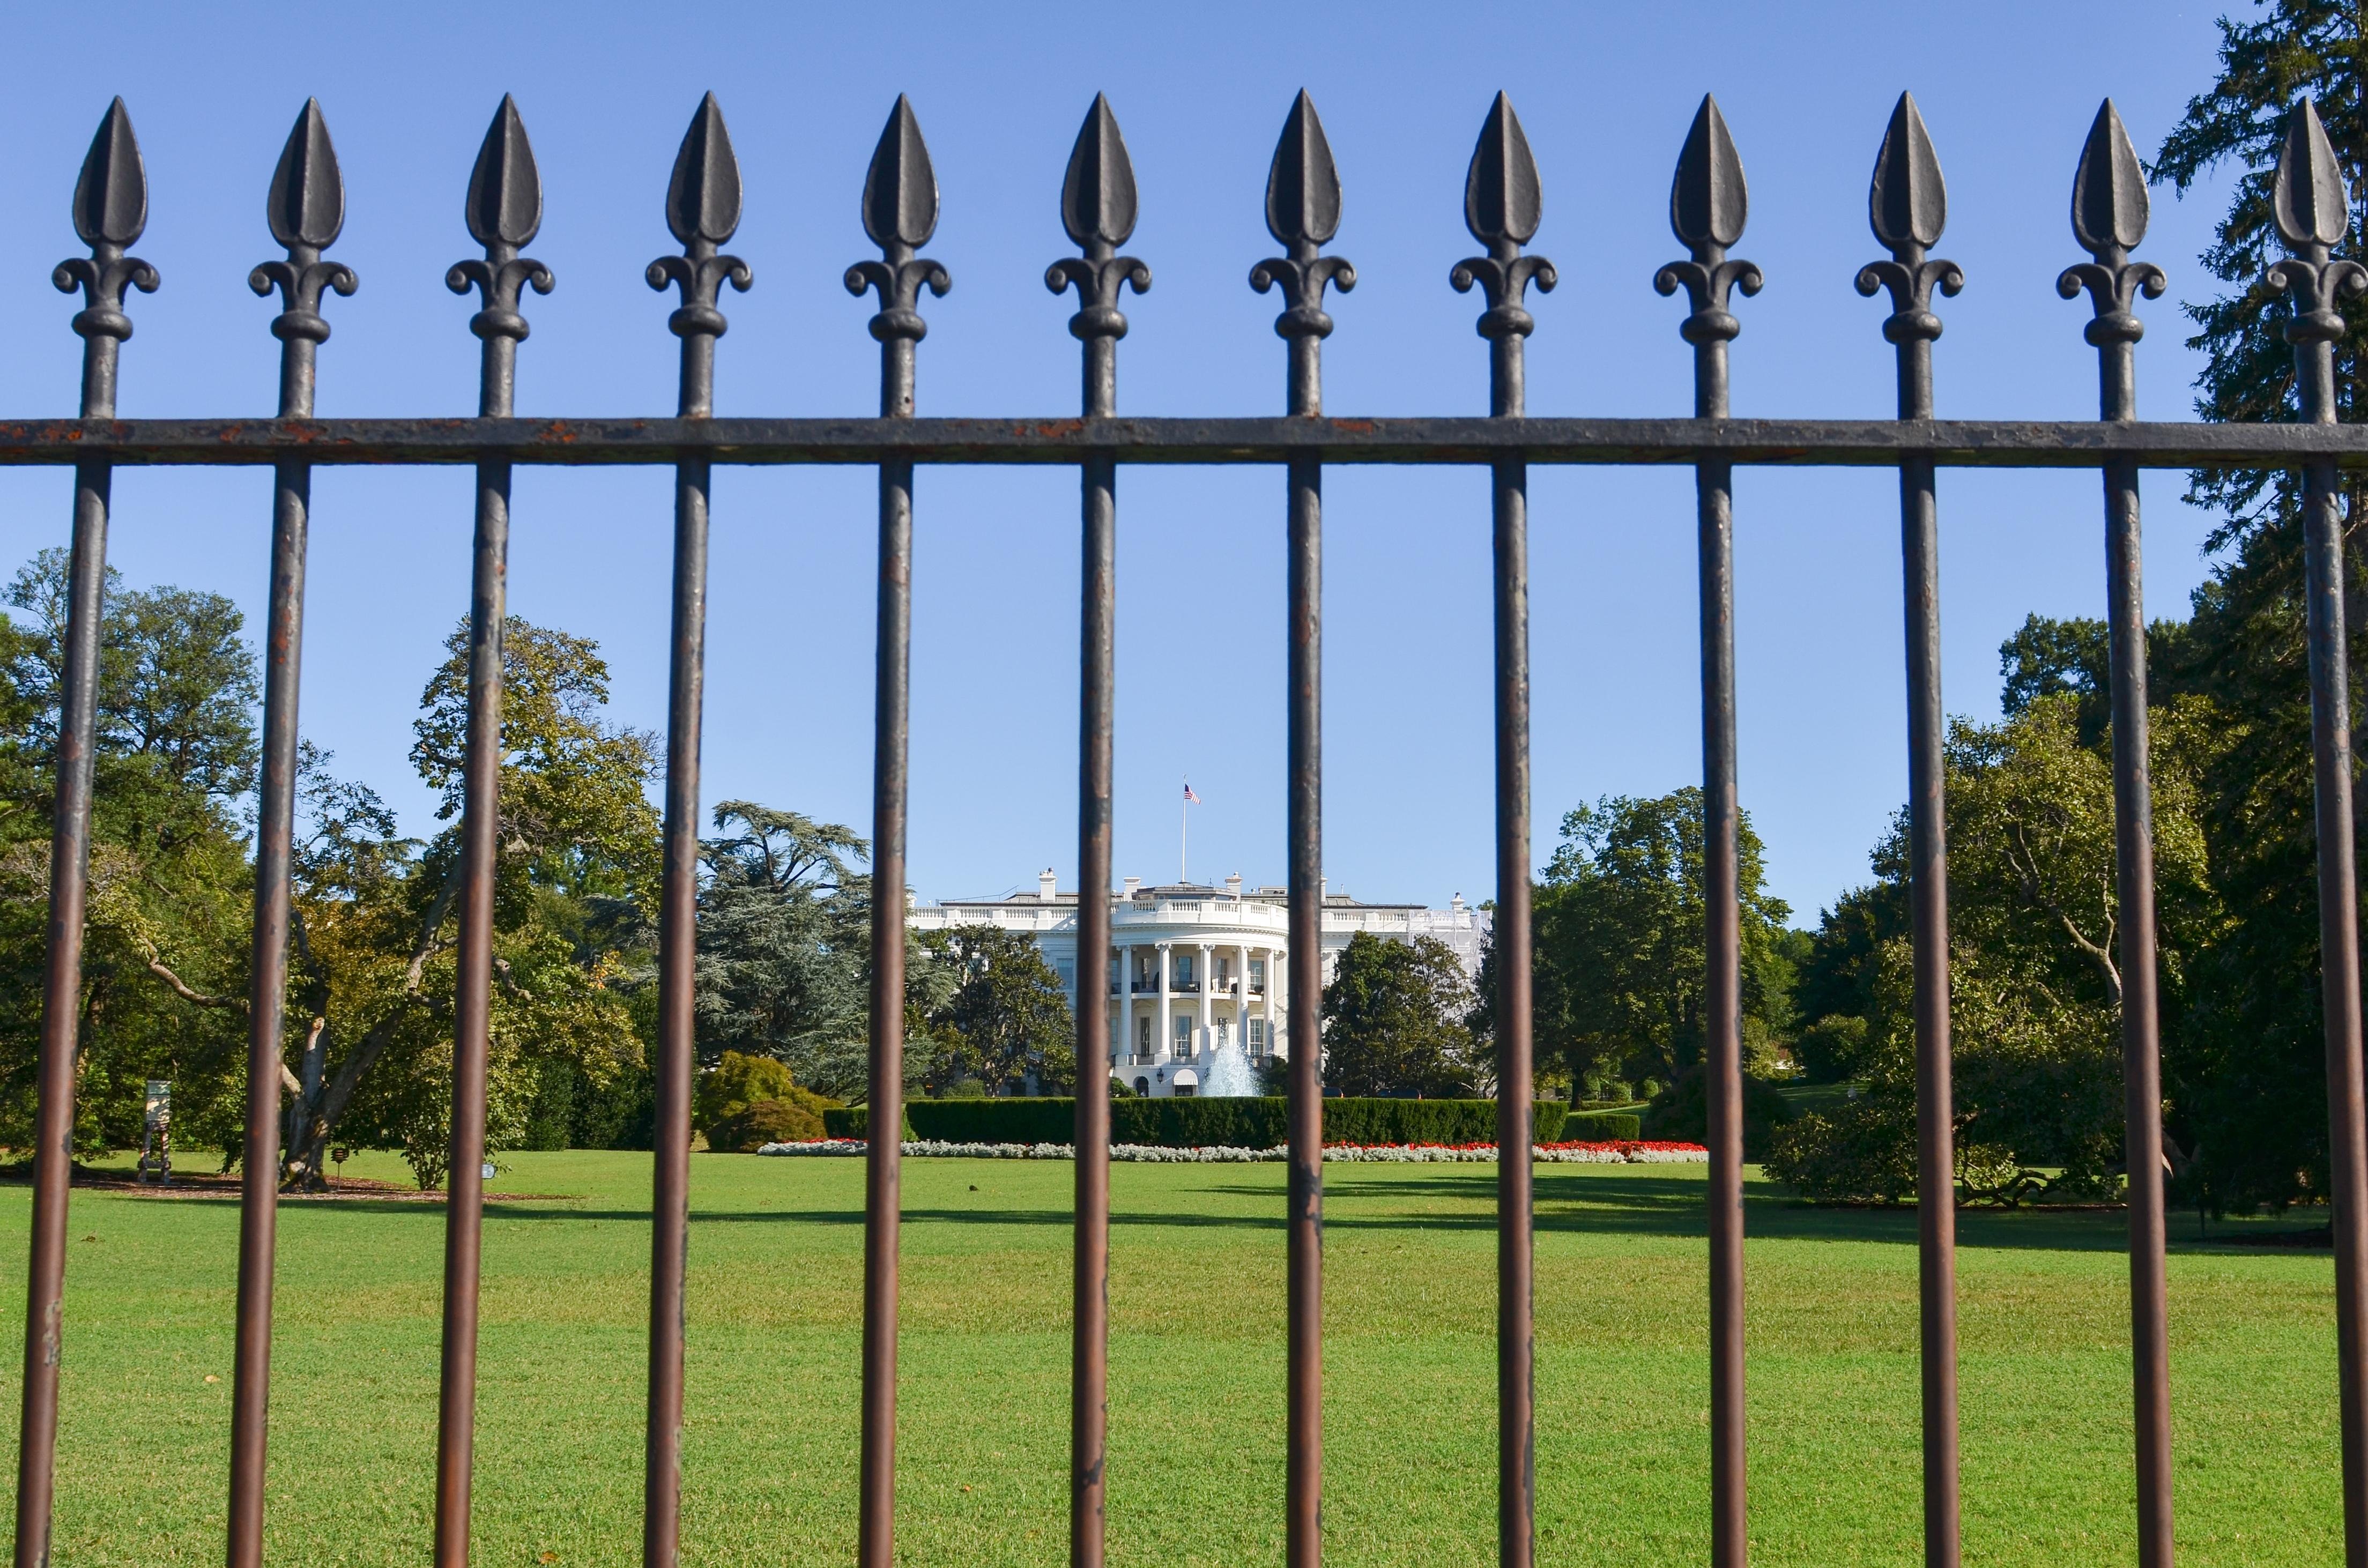 White House Fence. Shutterstock